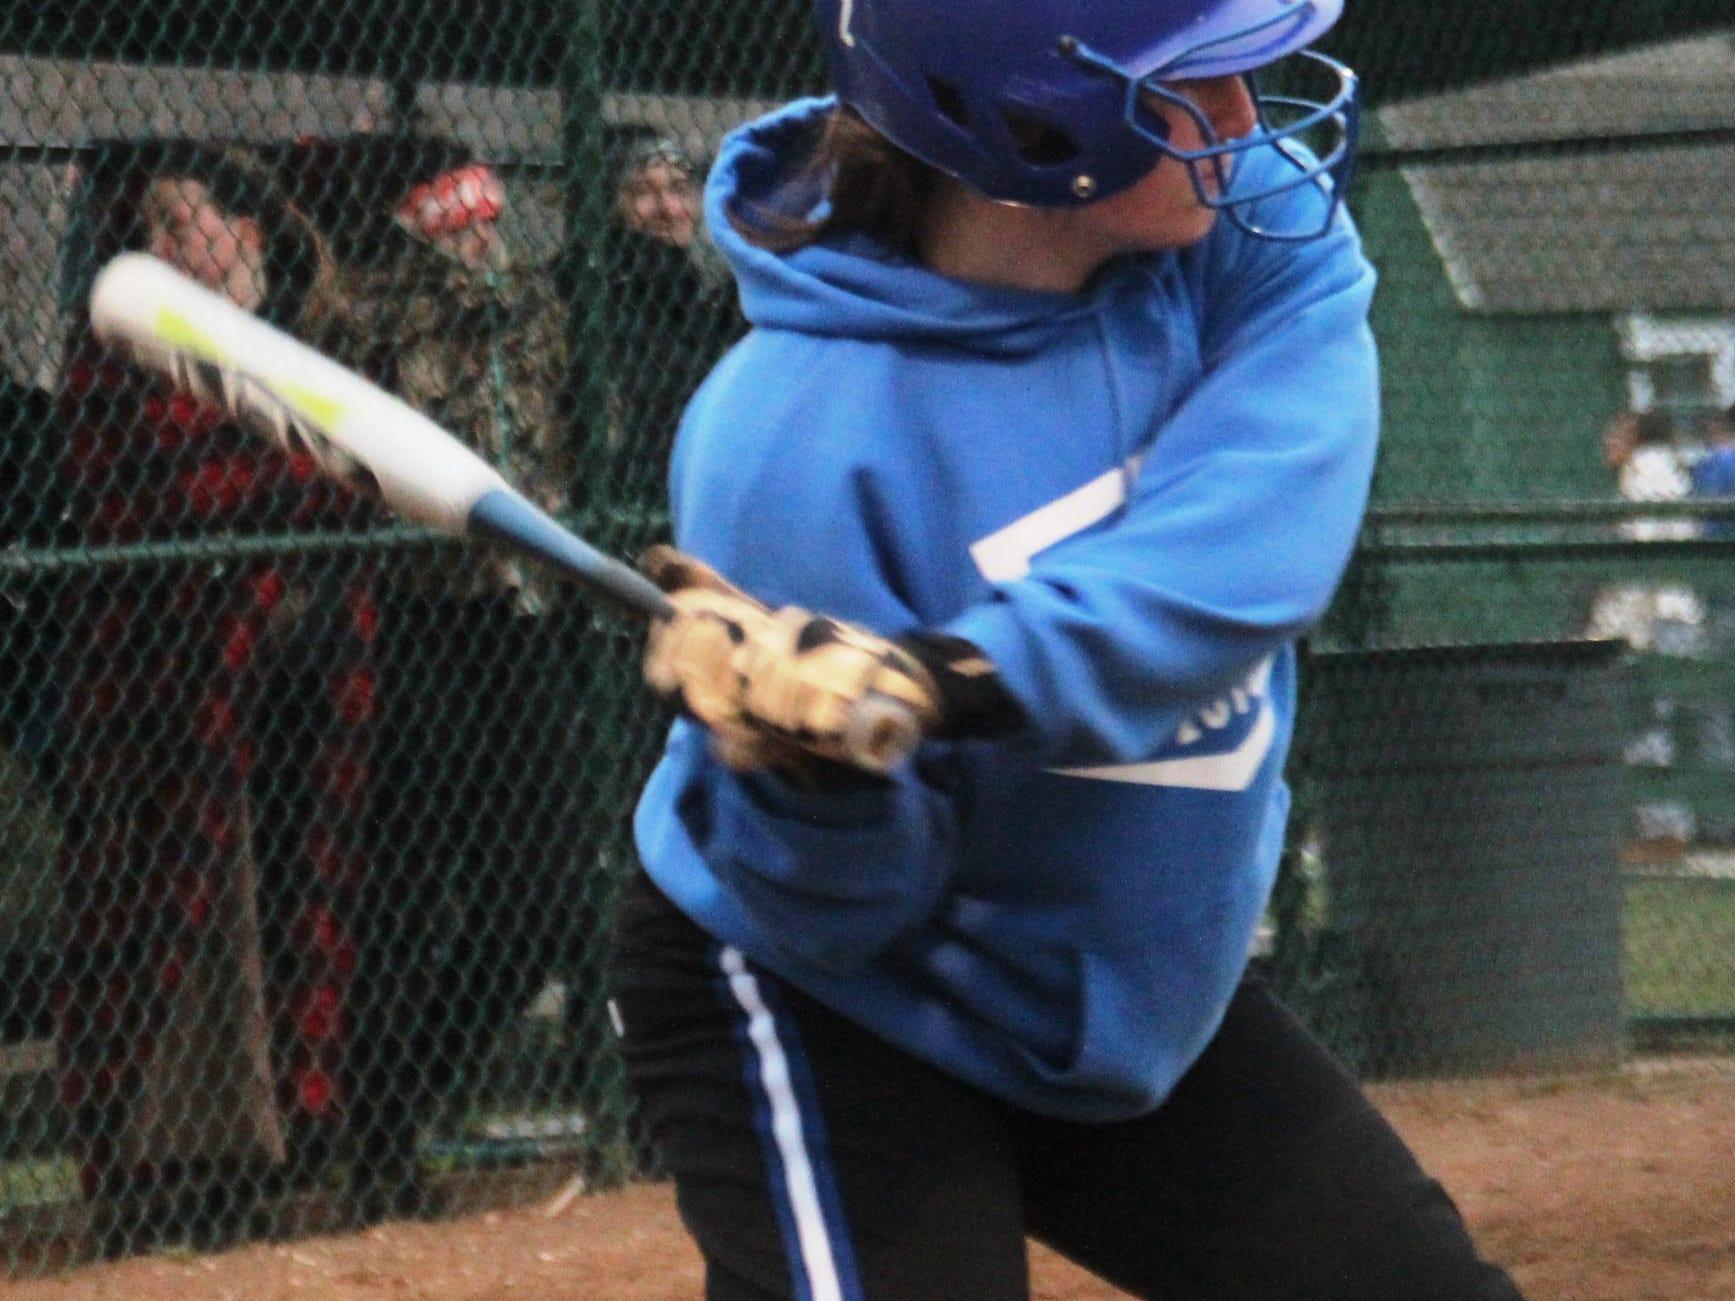 Senior Samantha Perkins is a veteran presence on a Simon Kenton softball team that has three sixth-graders and two eighth-graders.